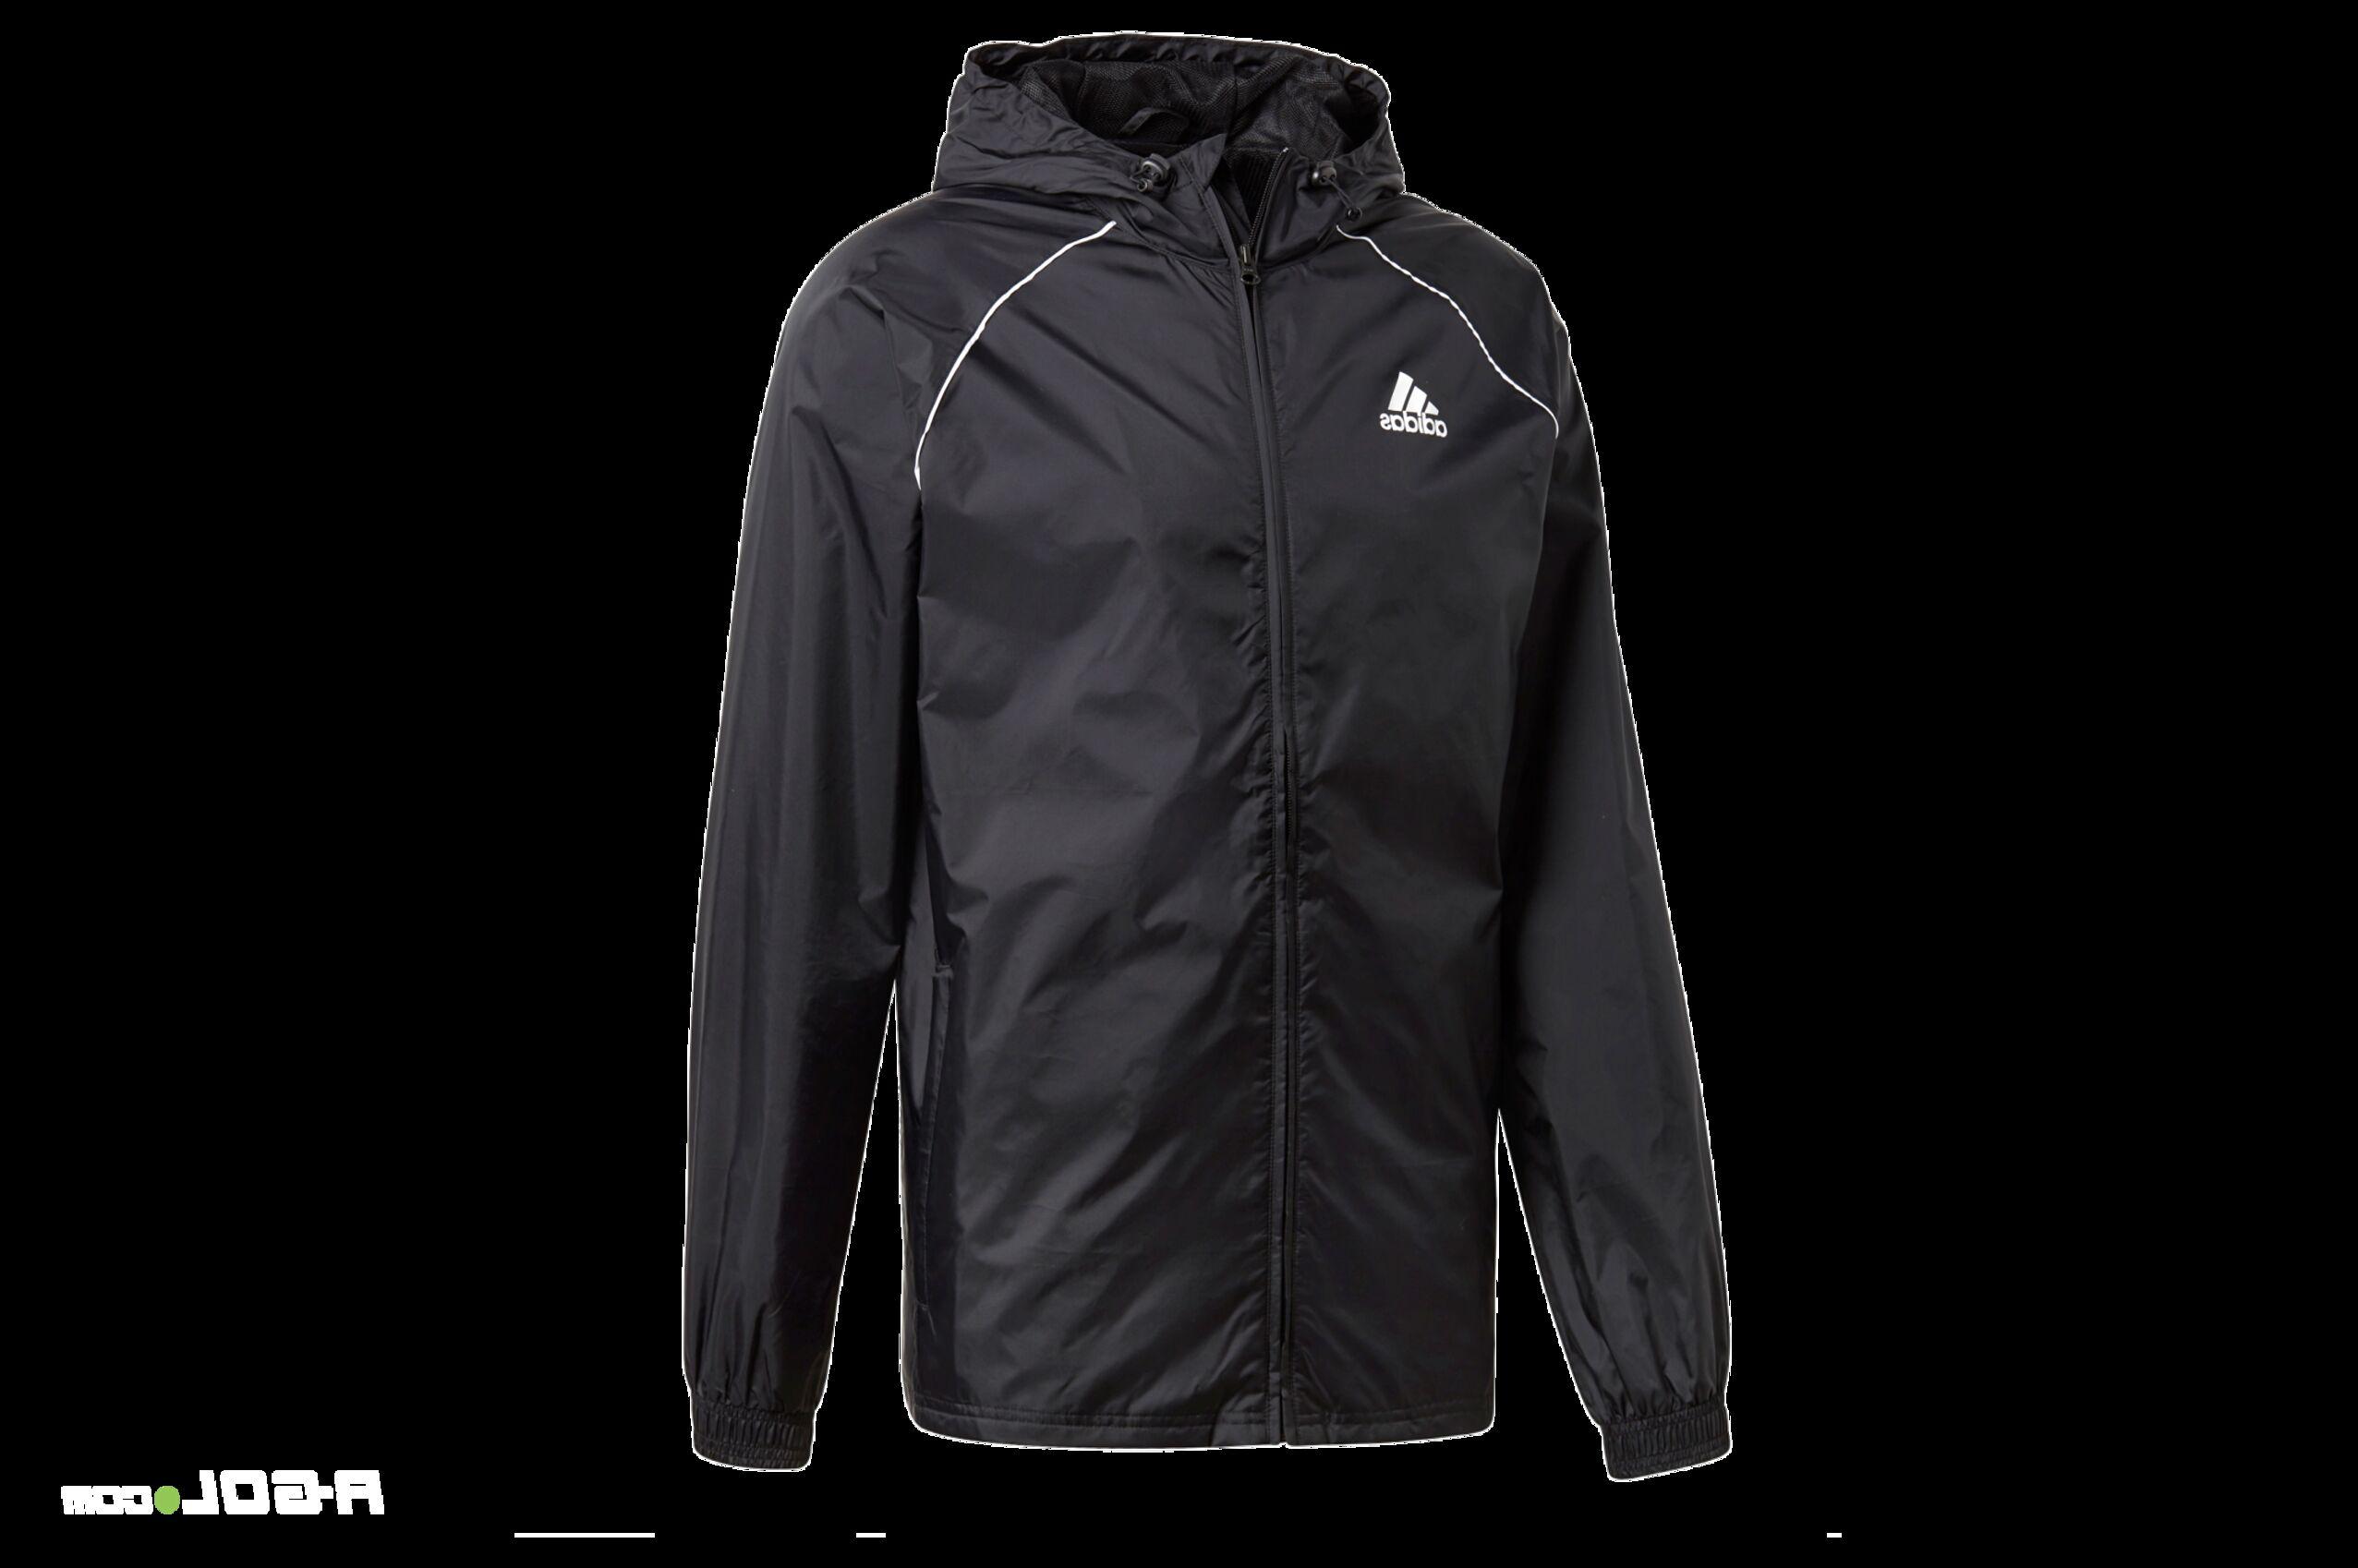 football rain jacket adidas for sale